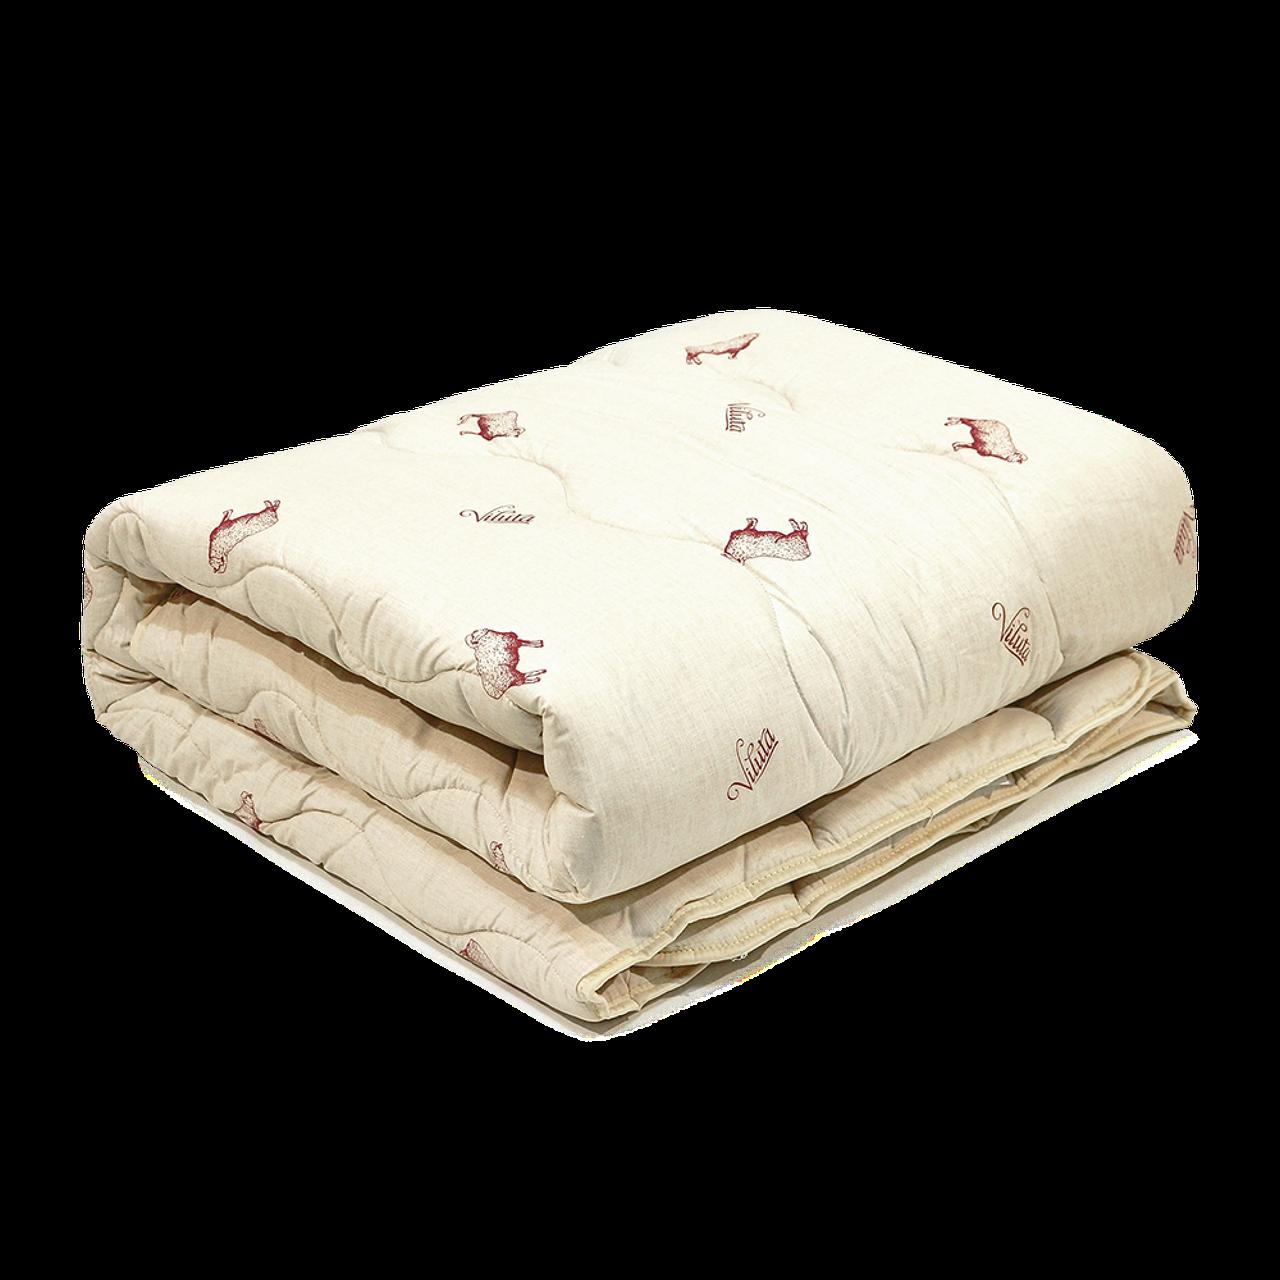 Одеяло шерстяное Полуторное стеганное Premium 140х205 Полуторное одеяло Осень Зима